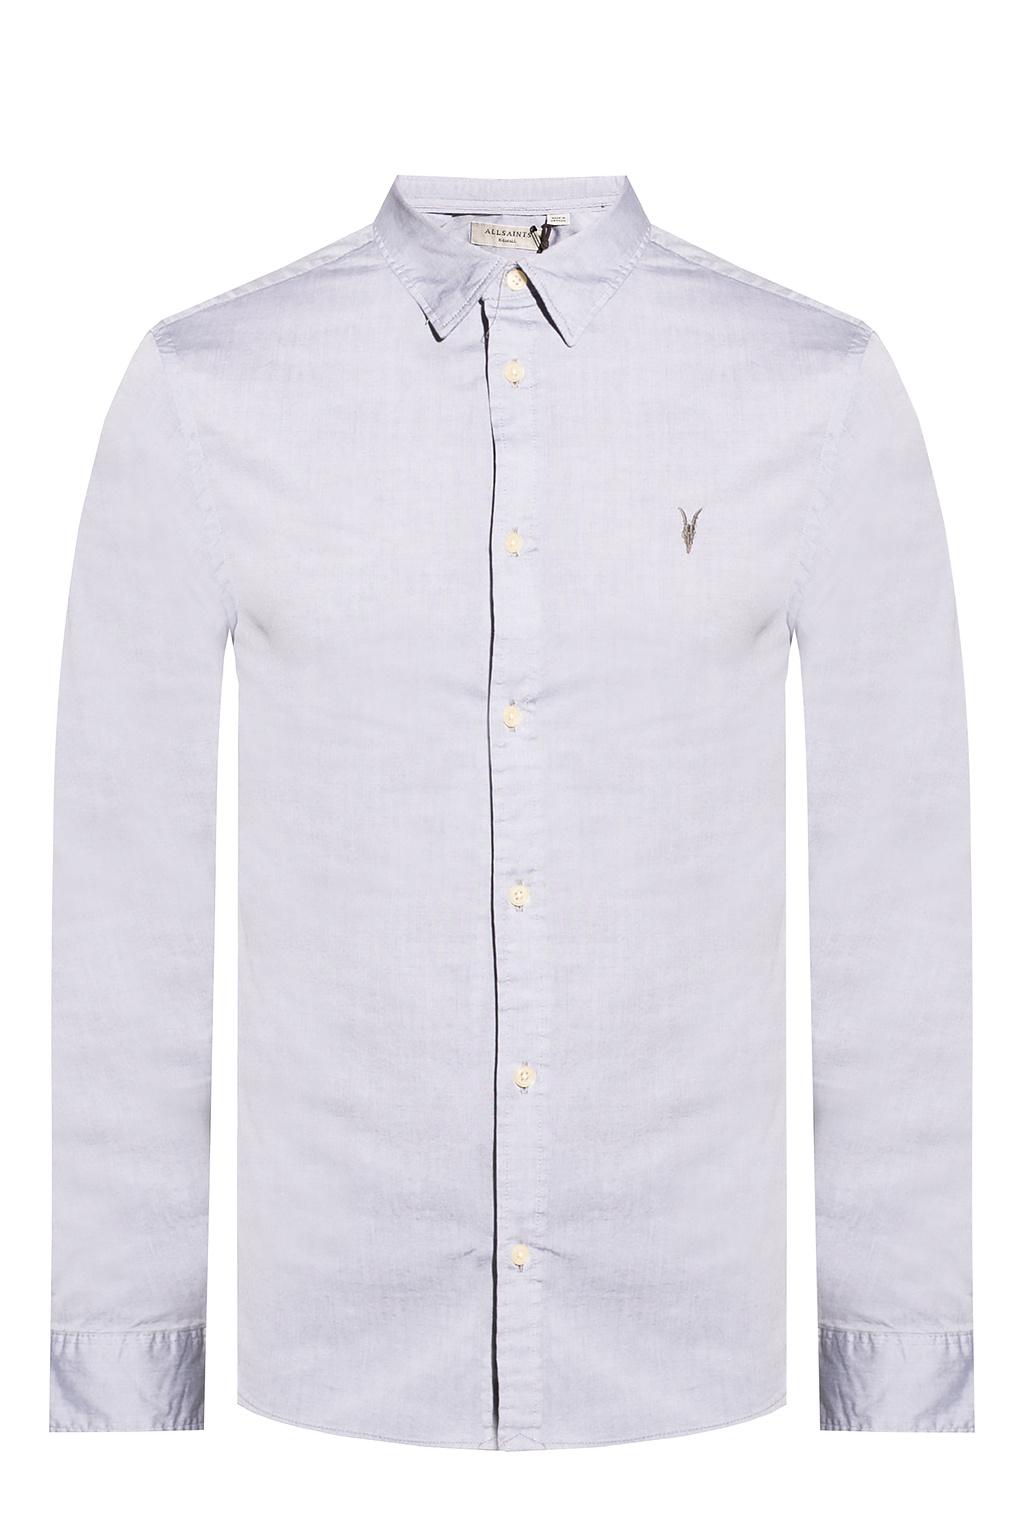 AllSaints 'Hawthorne' shirt